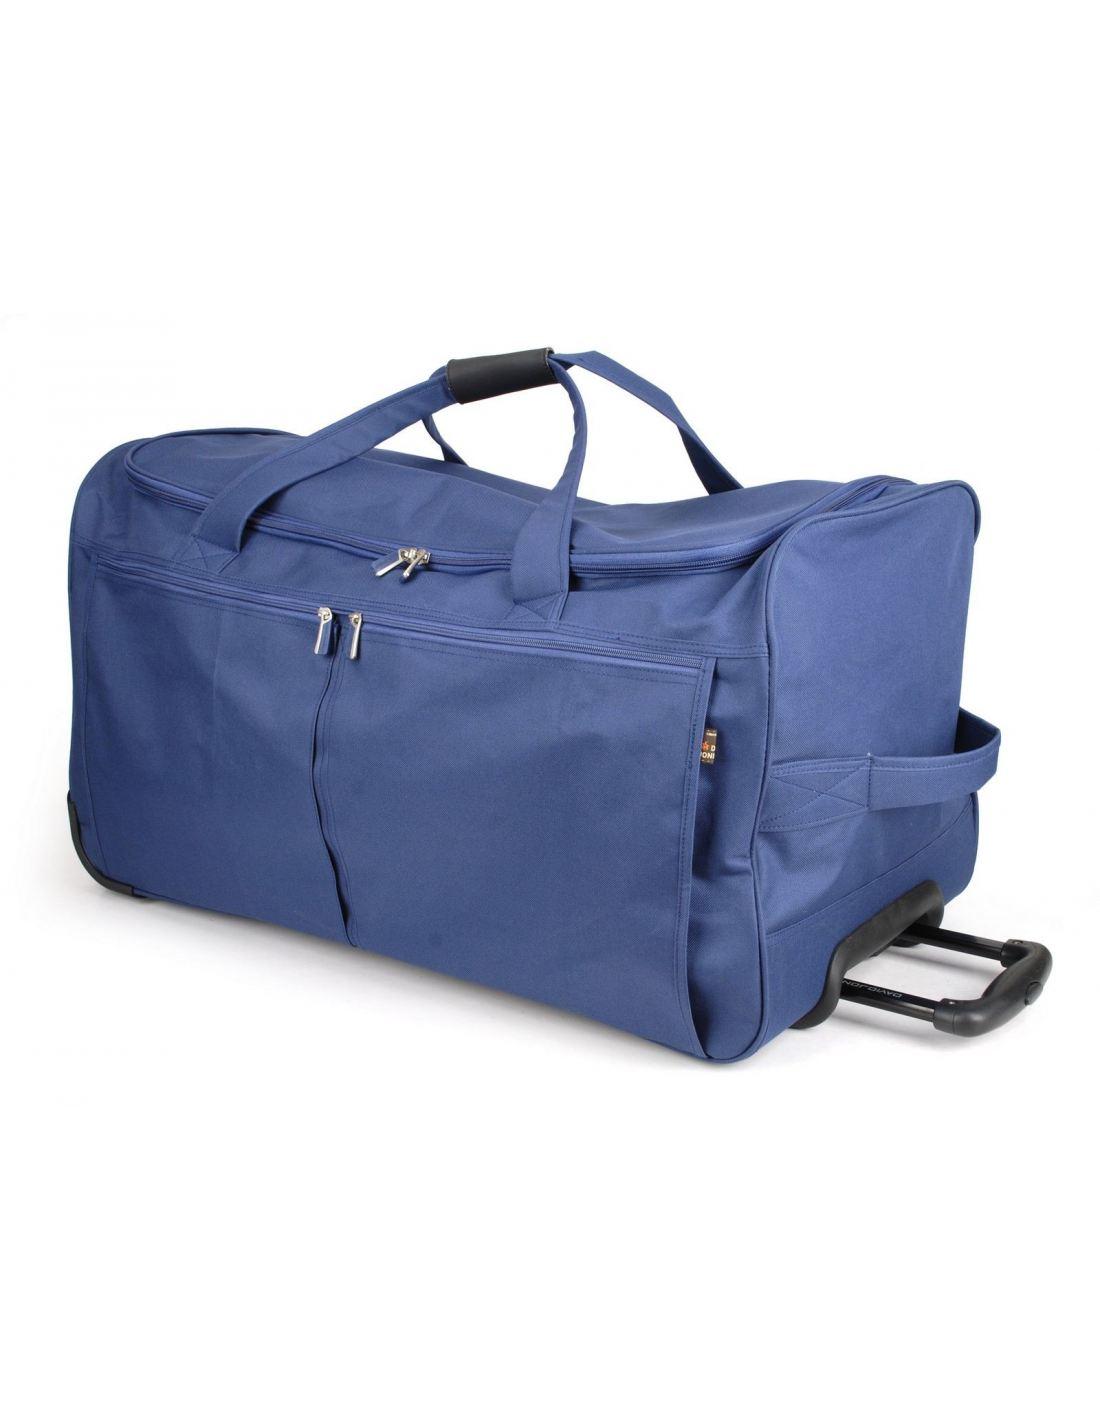 sac de voyage a roulettes valise souple trolley bagage a main